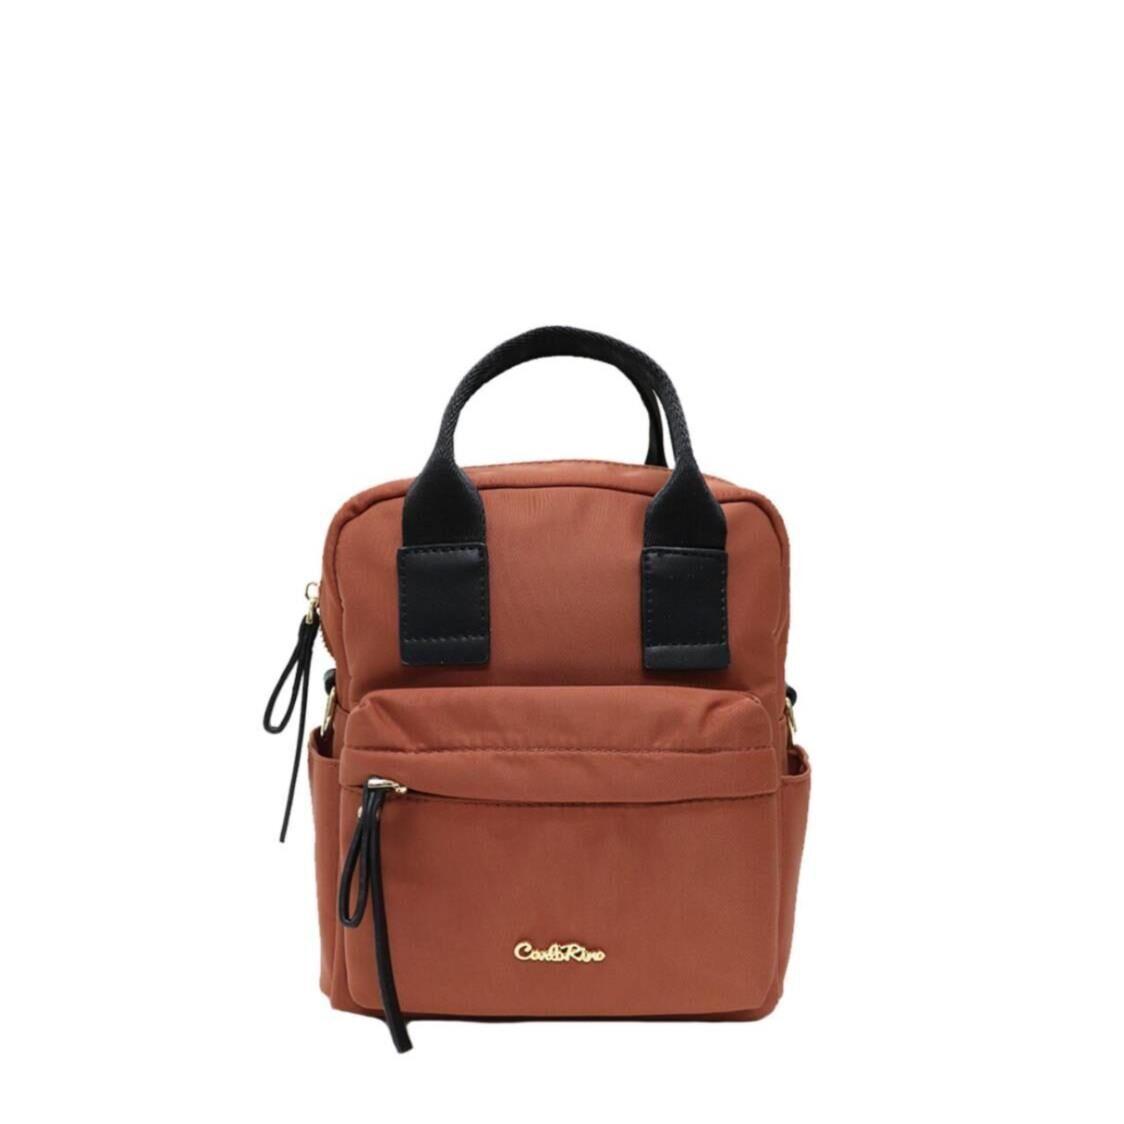 Carlo Rino Small Backpack Orange 34723-002-17